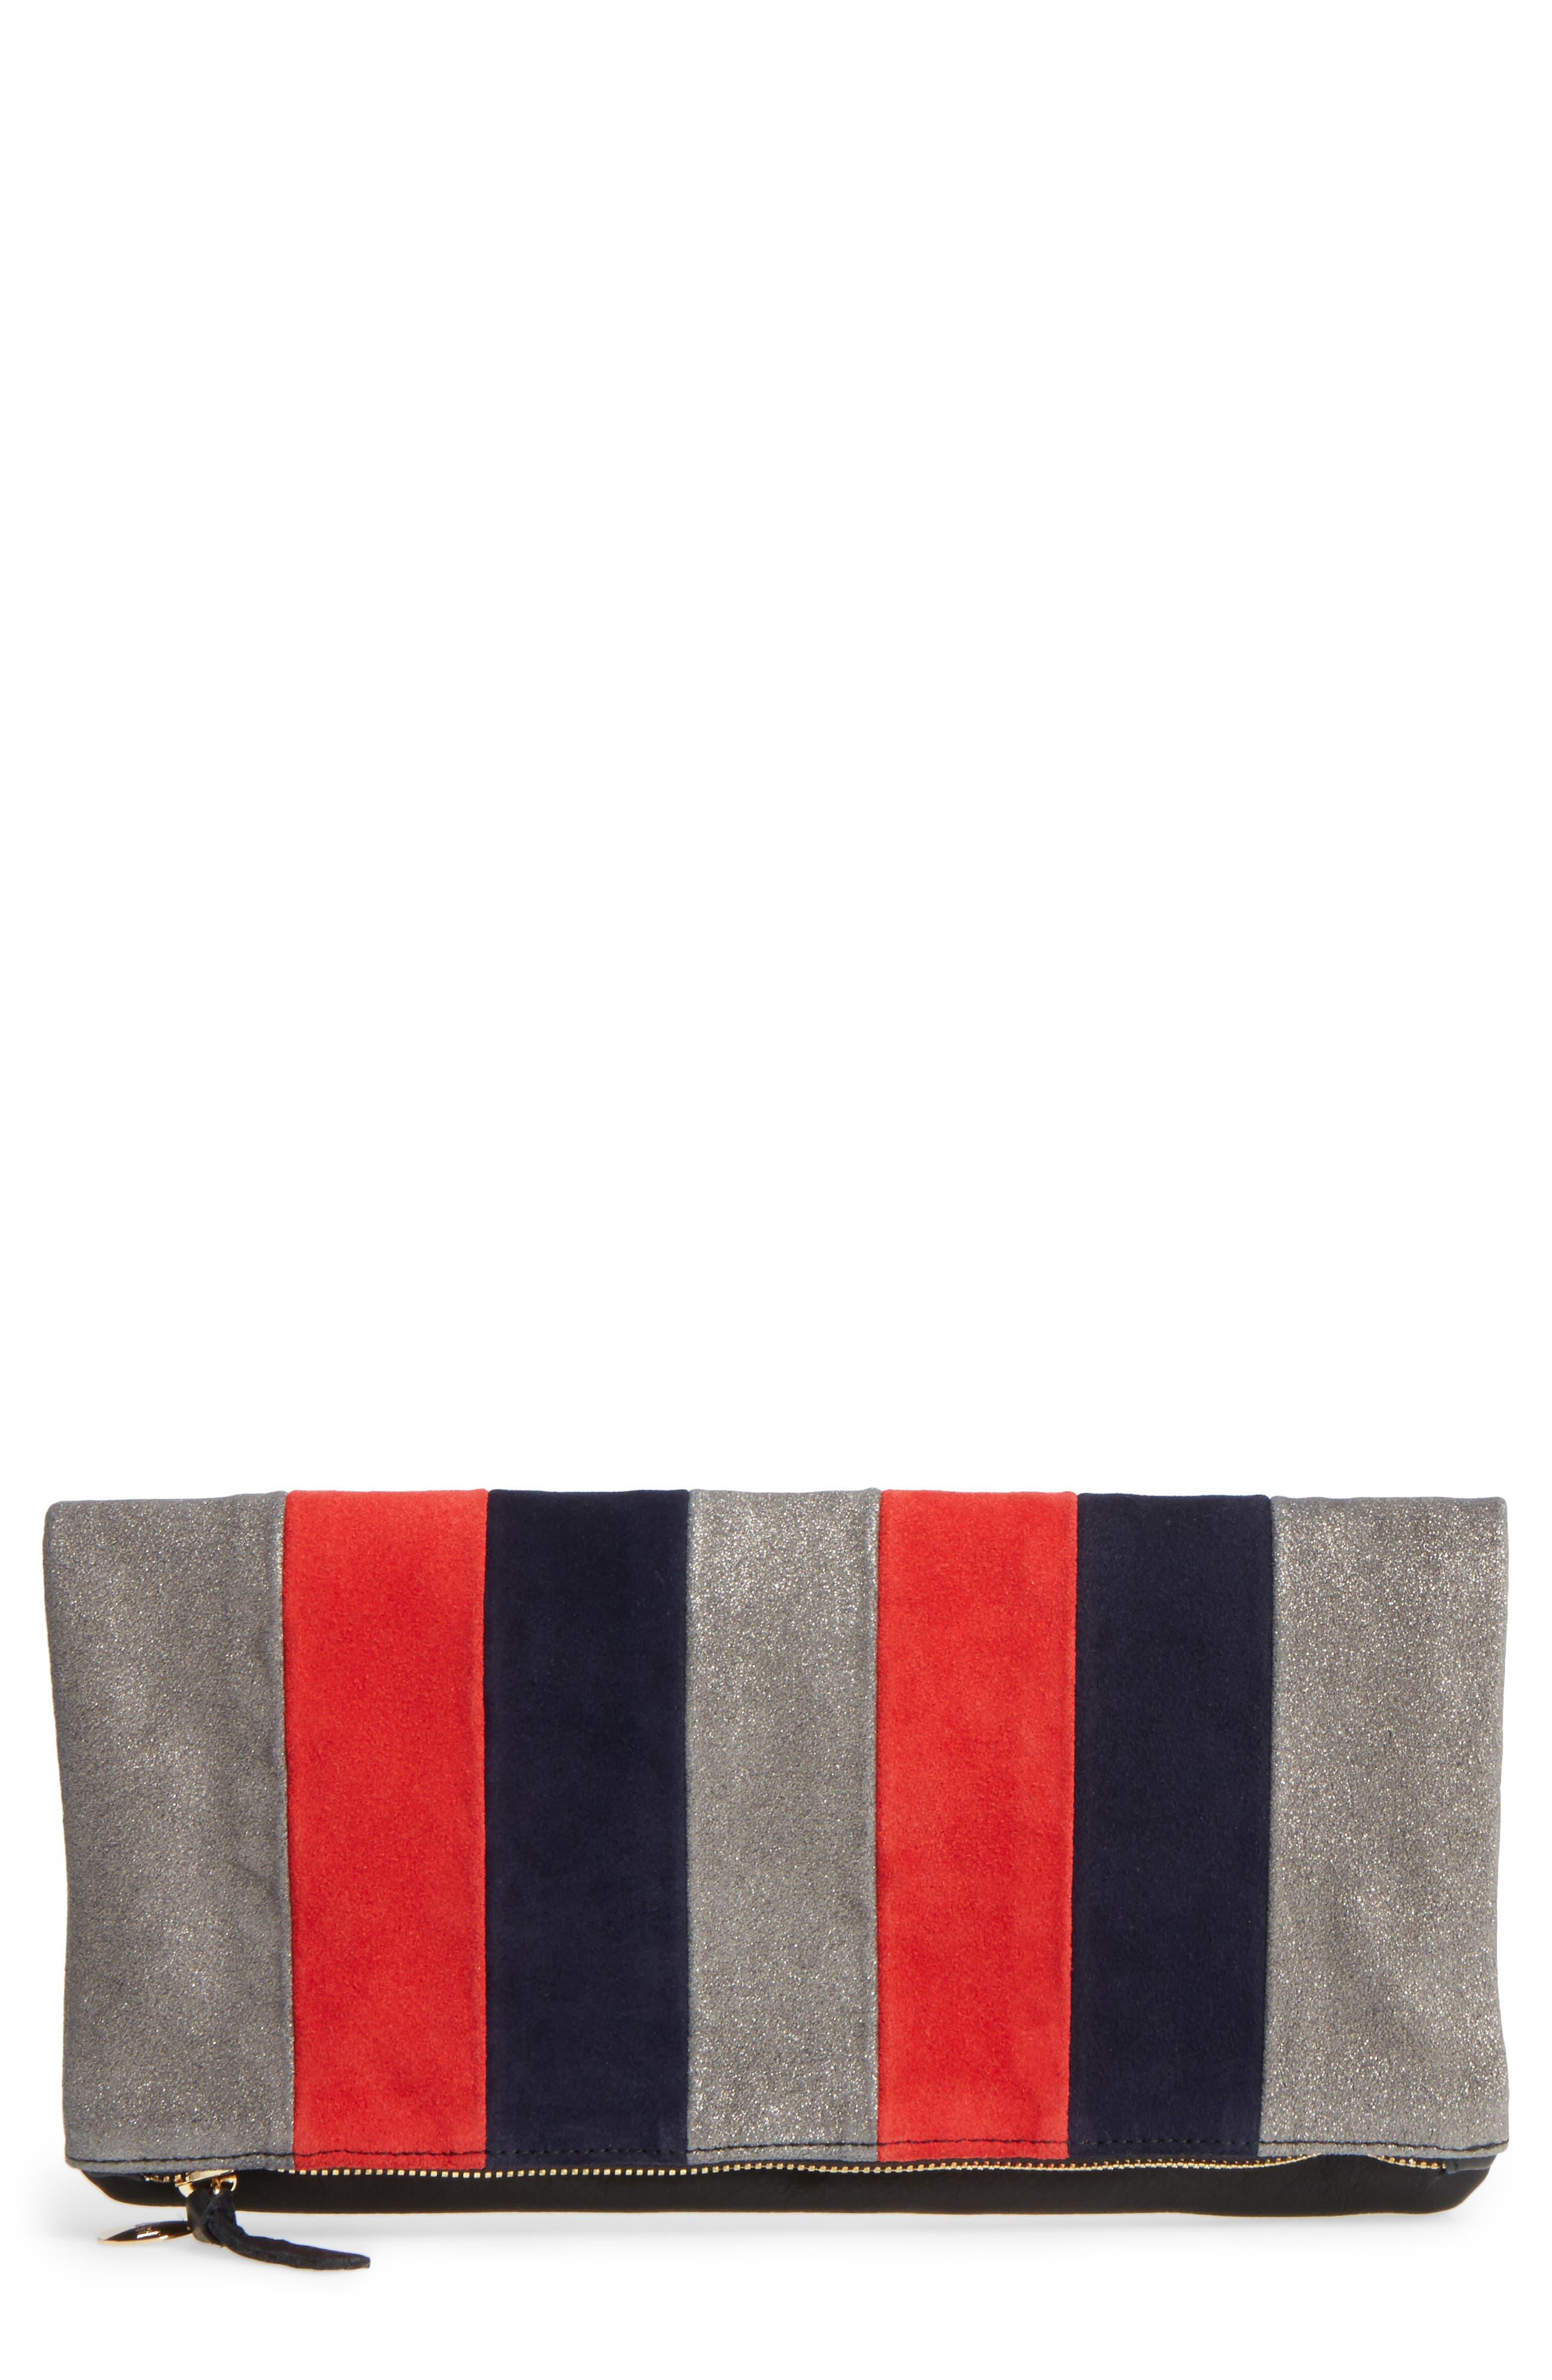 Mixed Media Stripe Leather Foldover Clutch,                             Main thumbnail 1, color,                             Zanzibar Stripe